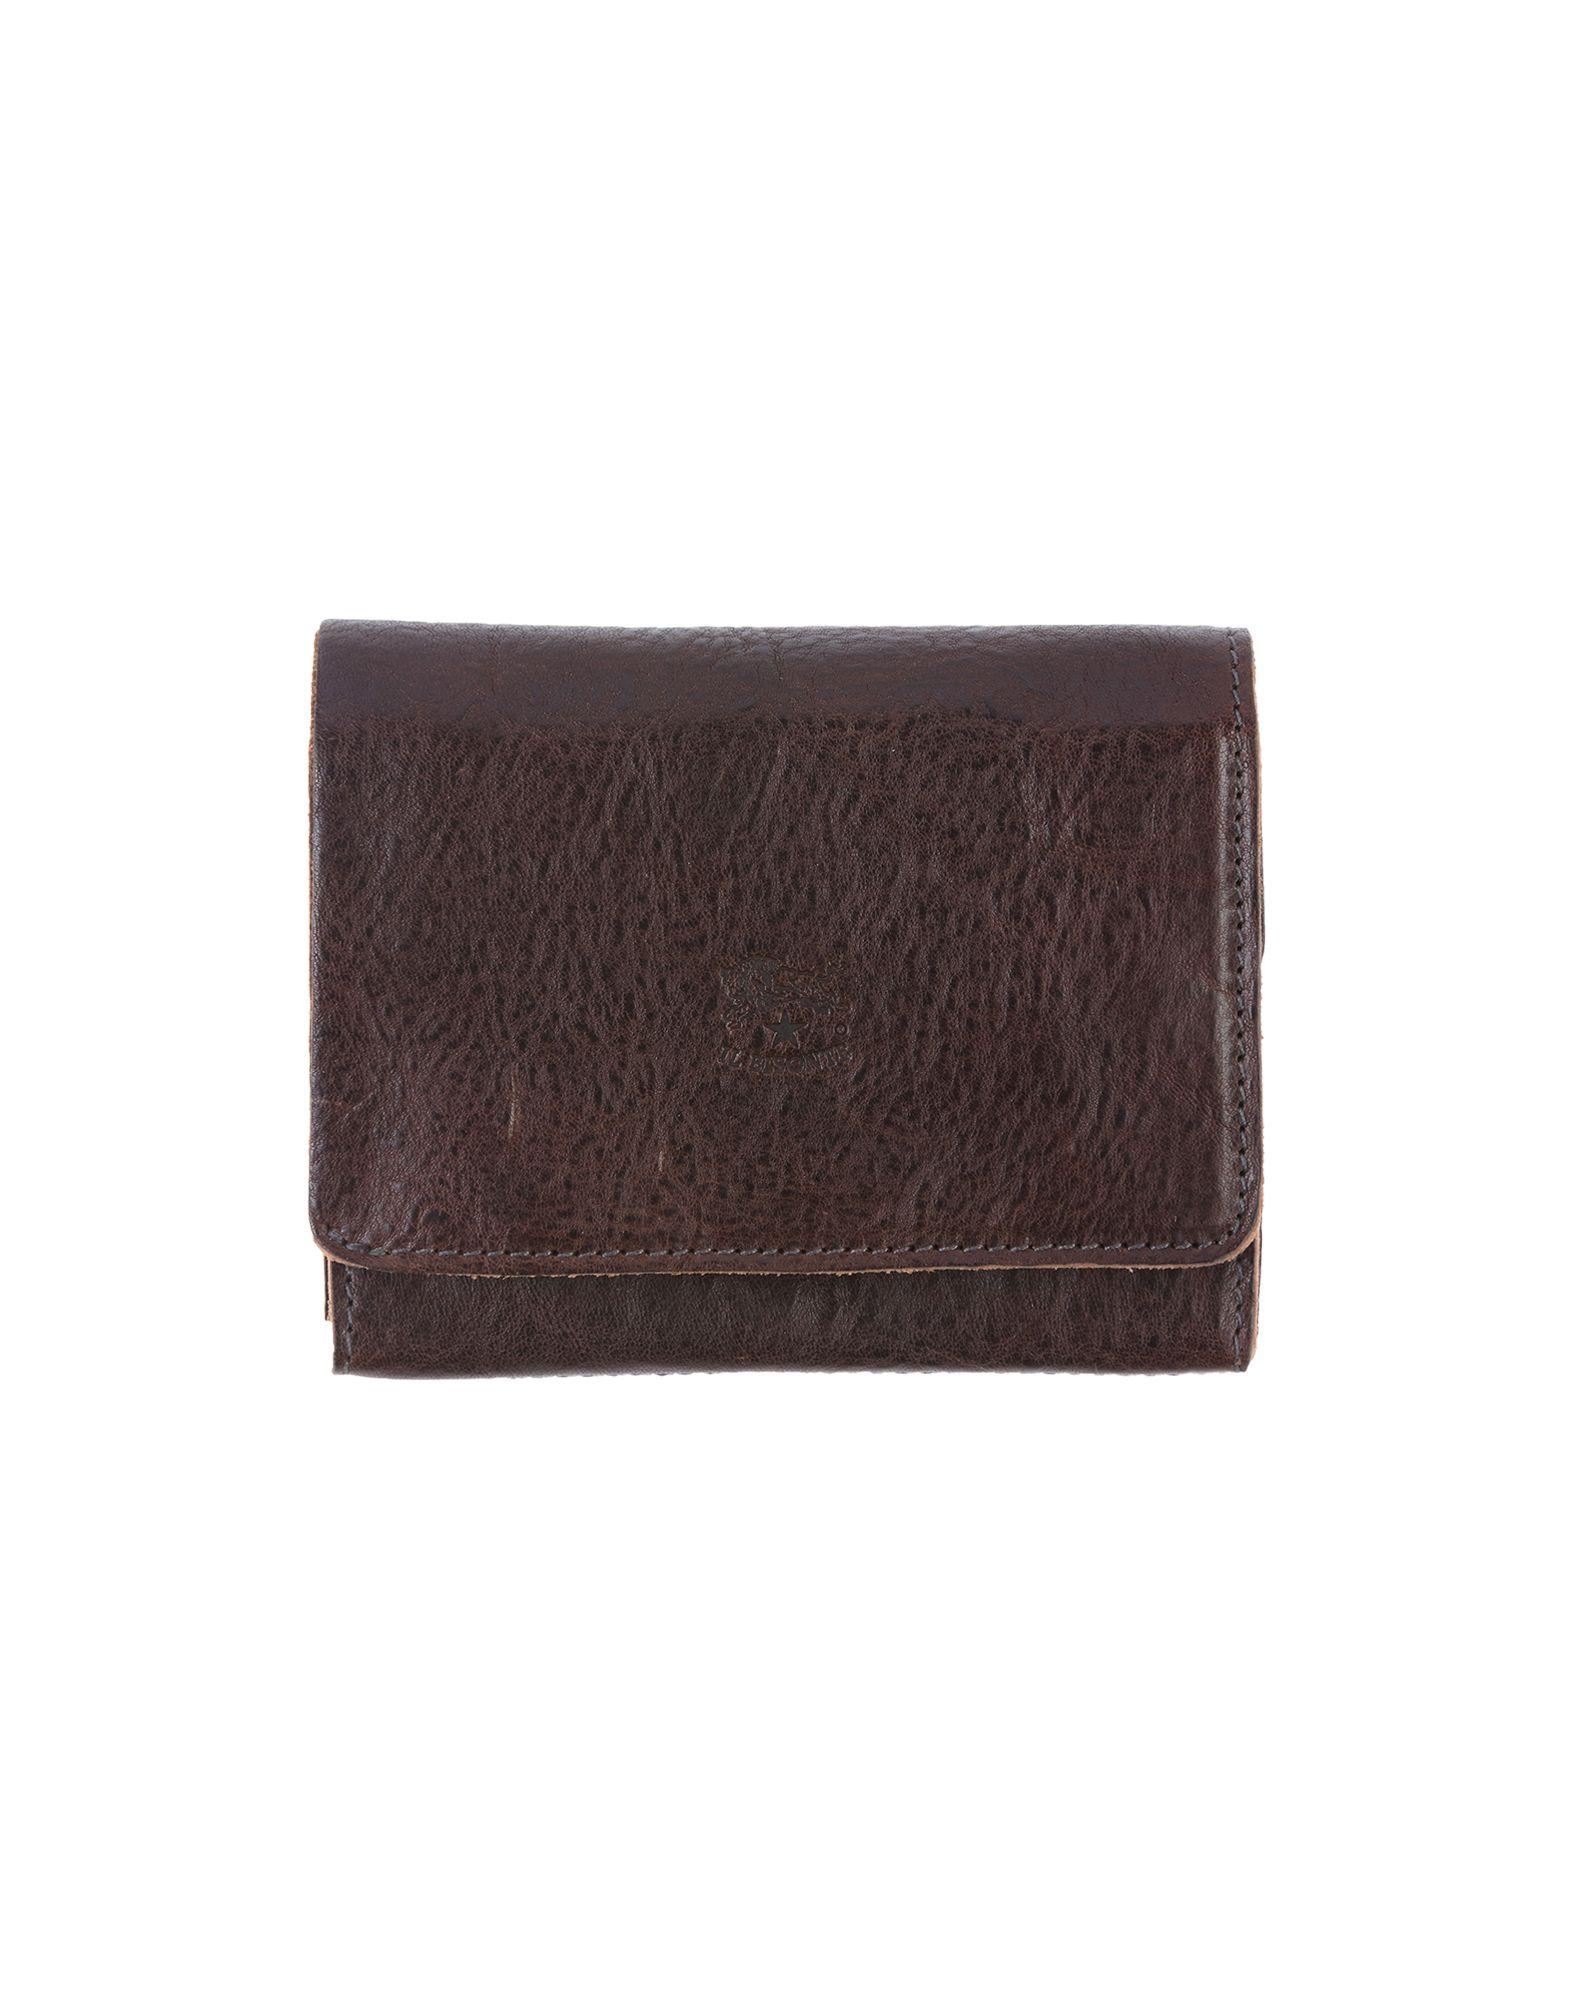 IL BISONTE Бумажник цена и фото